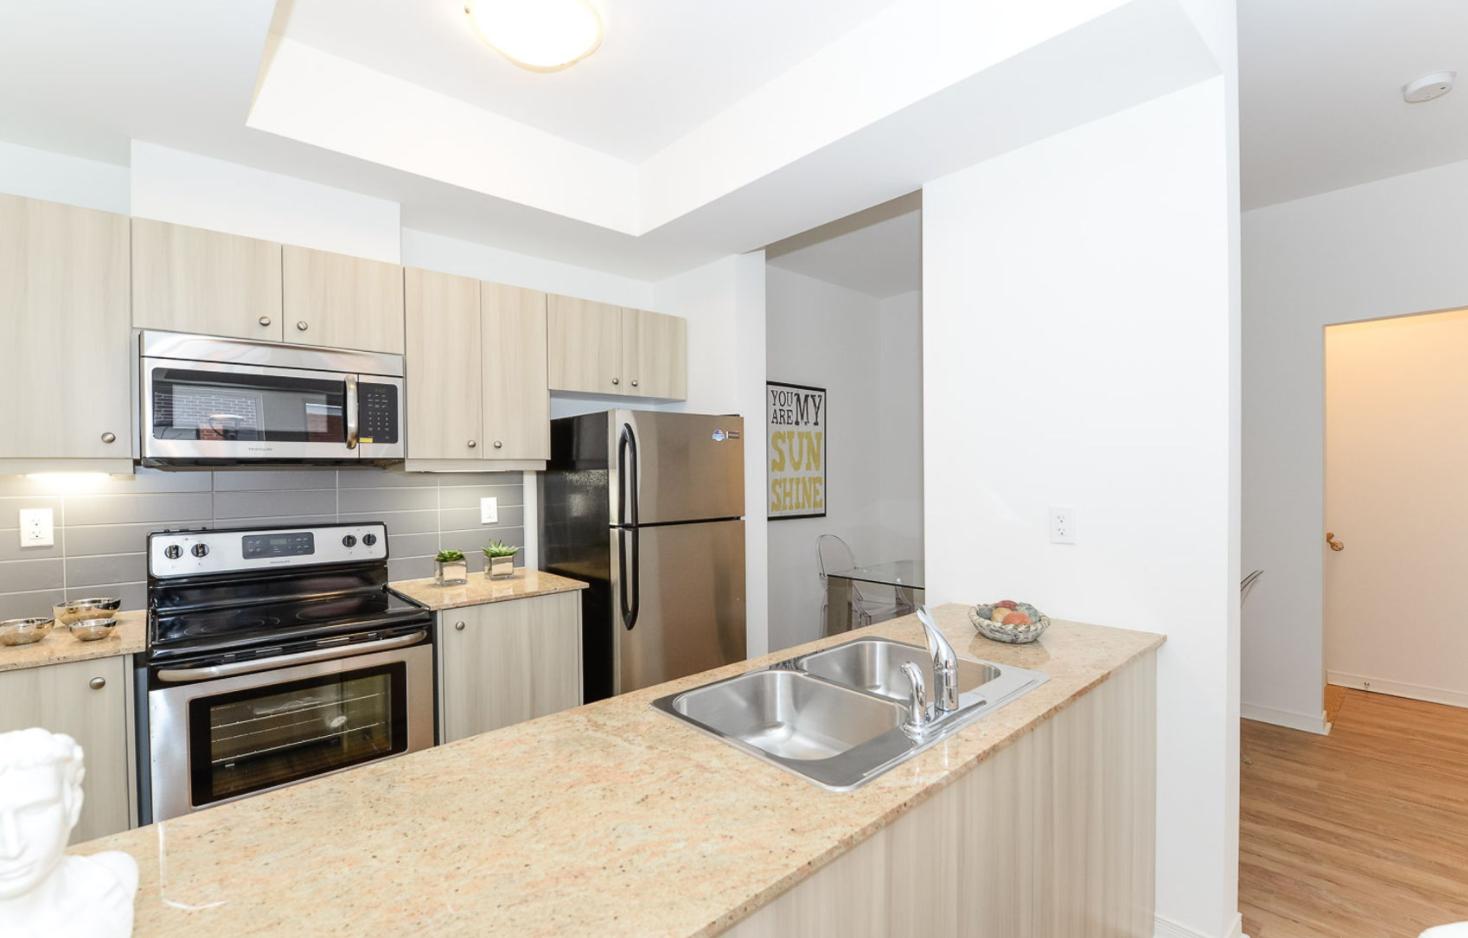 2-Bedroom Condo Townhouse: 68 Winston Park Blvd #44 - Morrison Sells ...